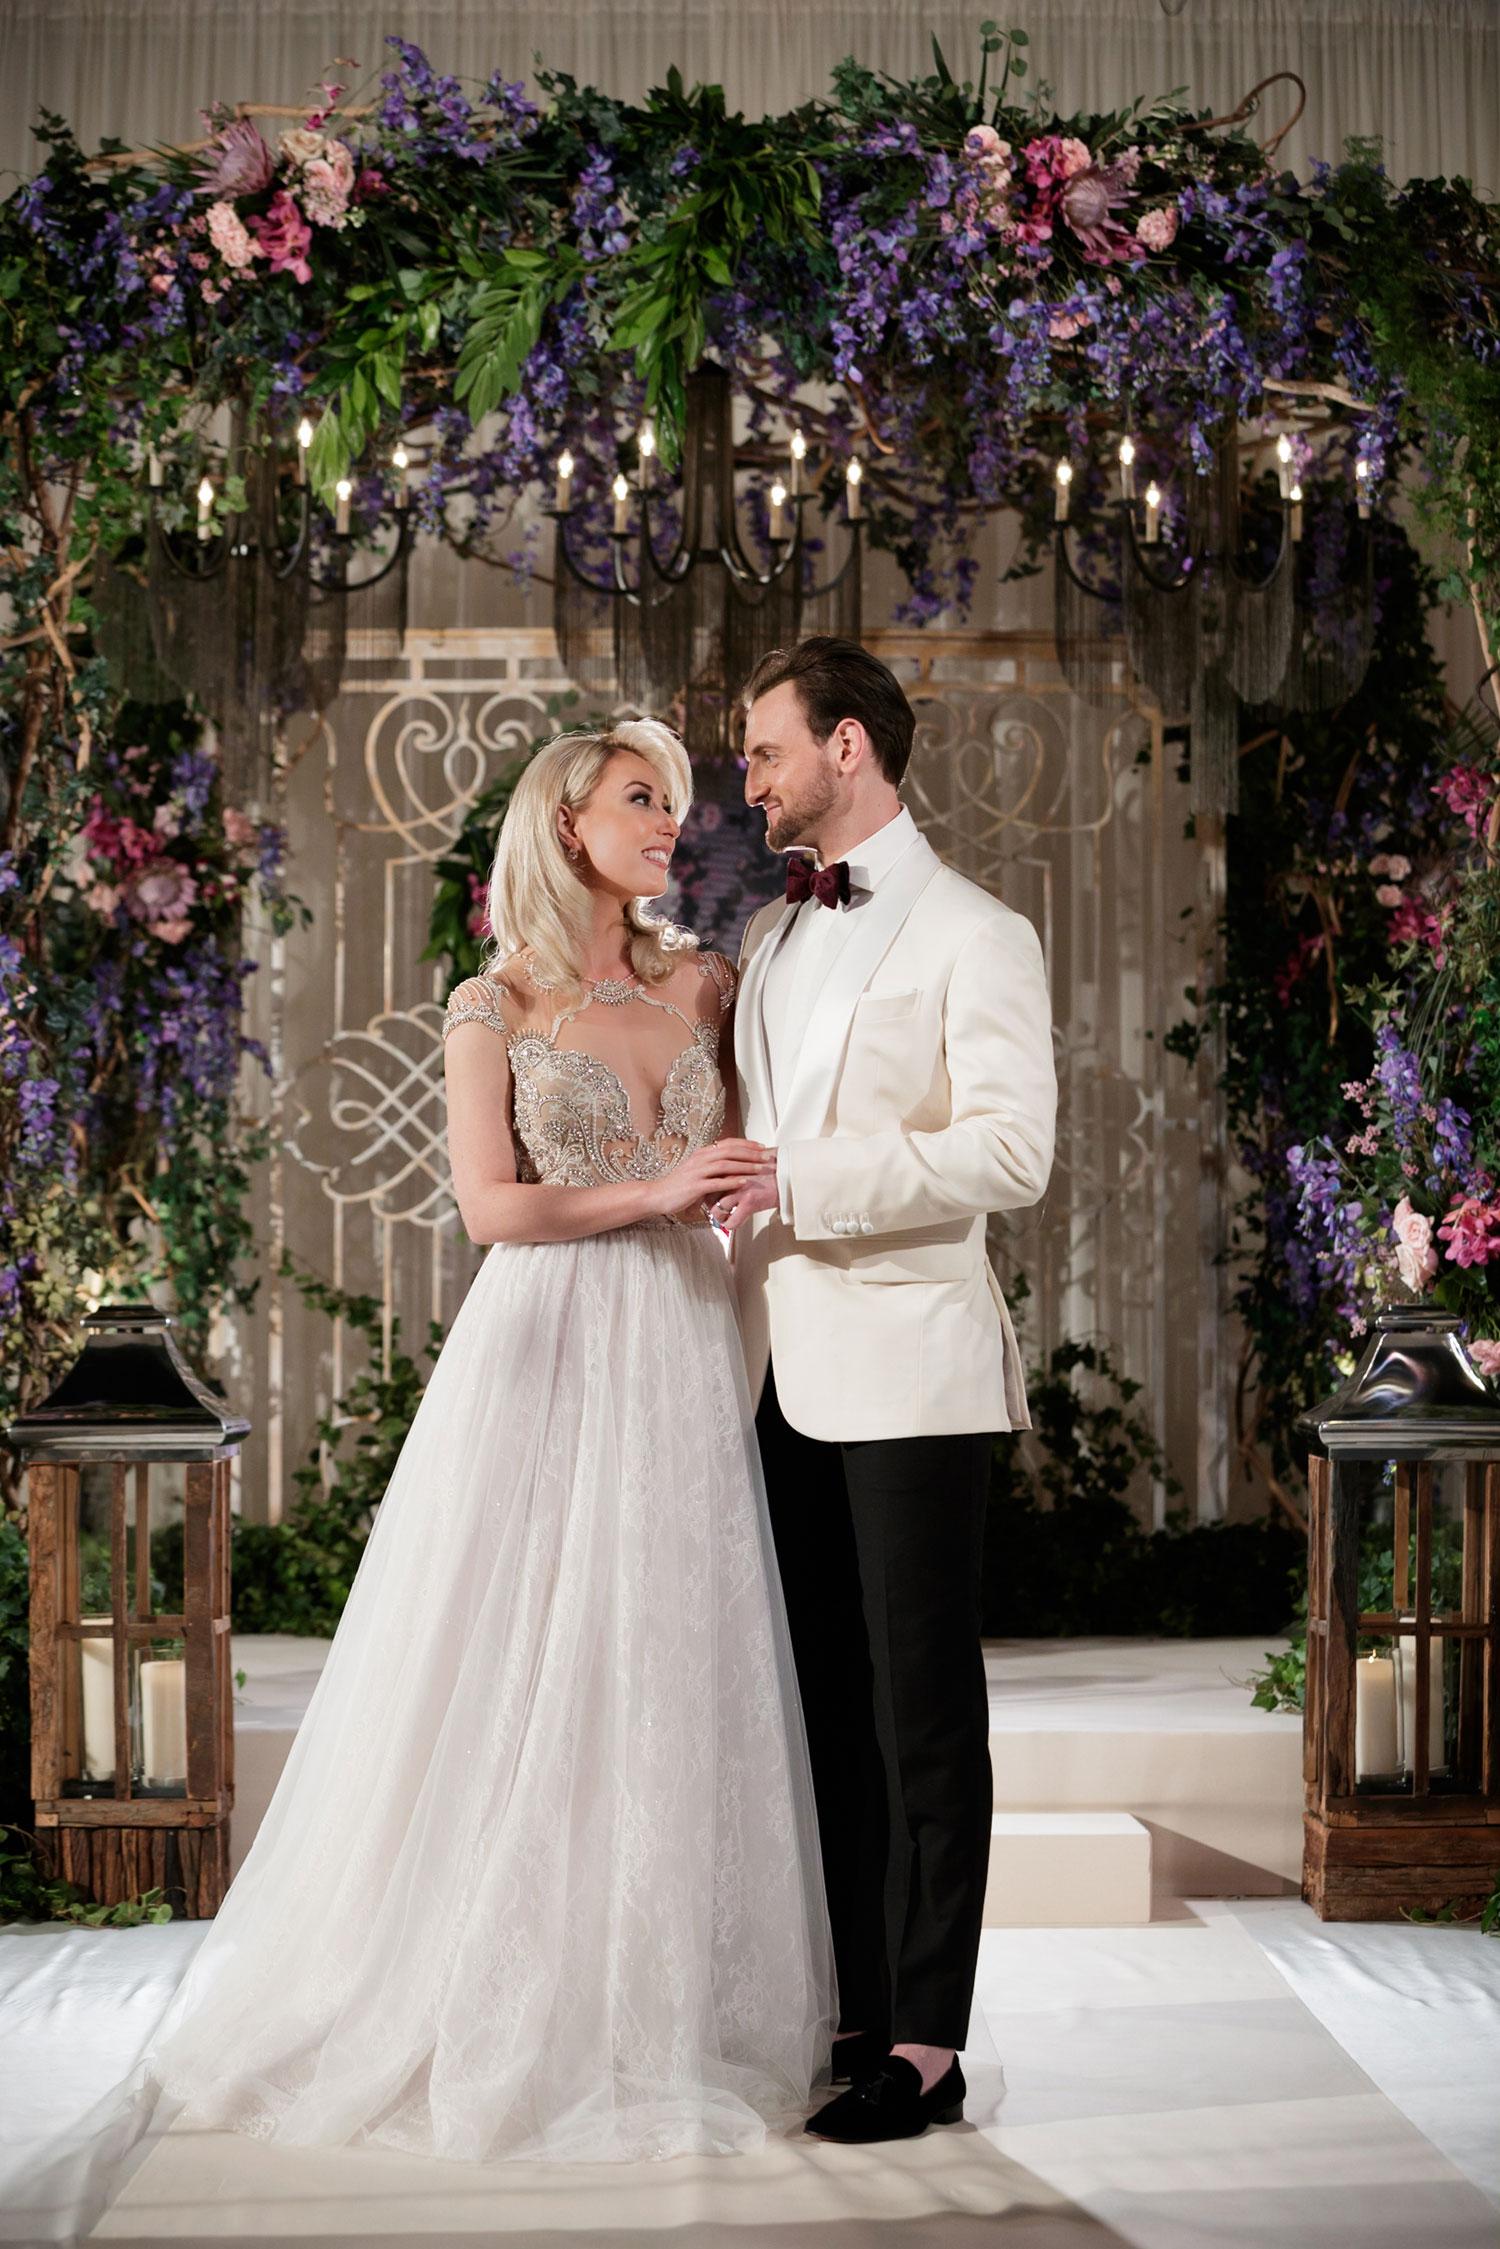 Inspired Wedding styled shoot A Romantic Affair Bob & Dawn Davis Photography bride and groom flower arch